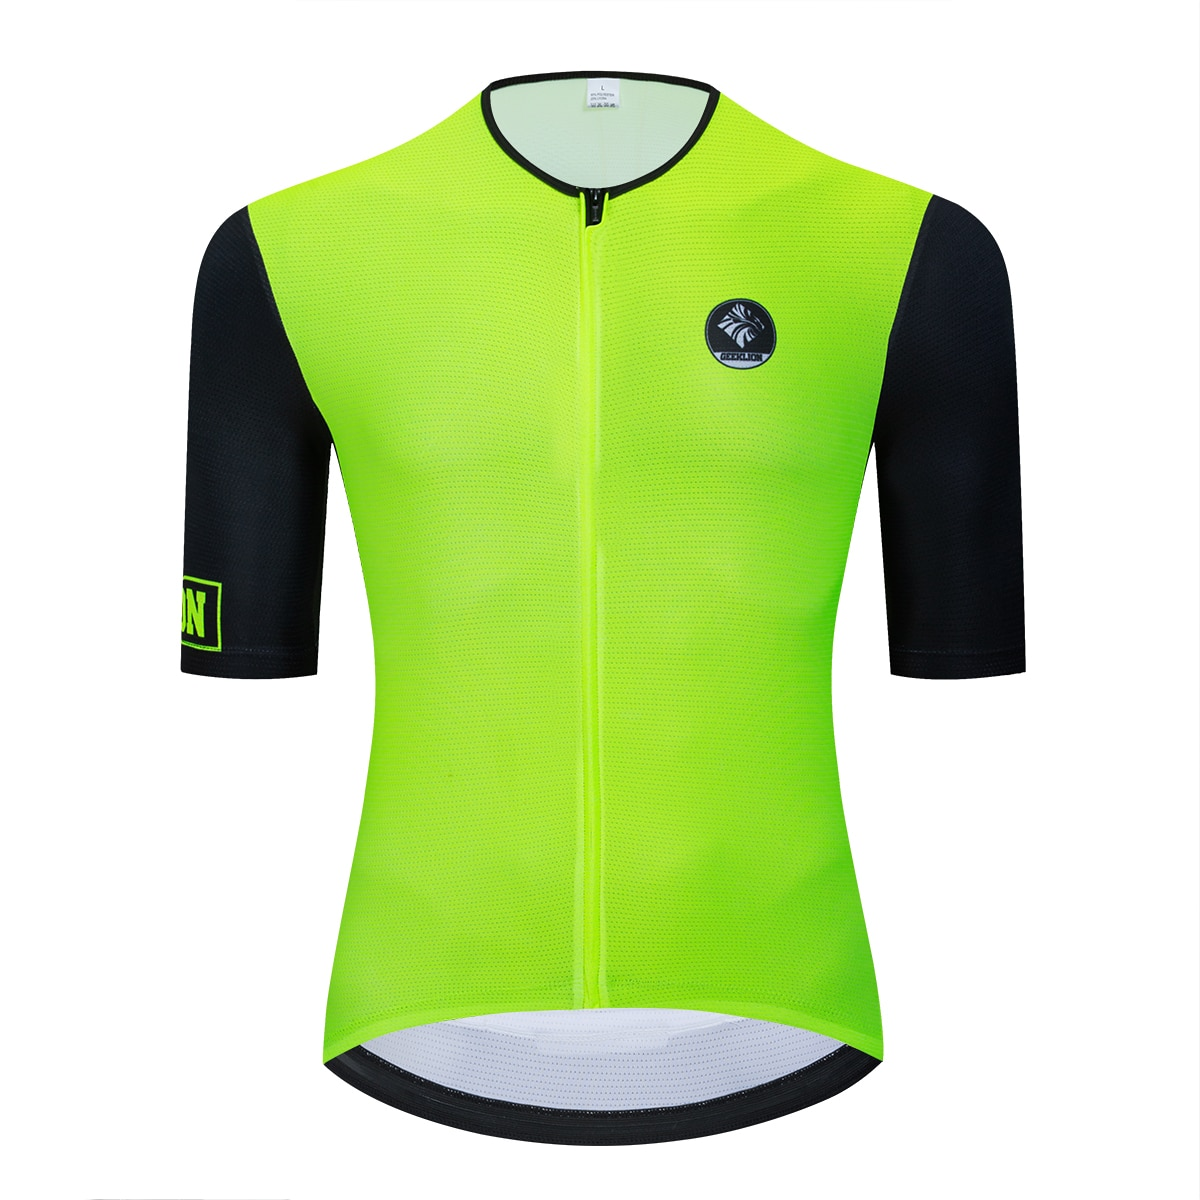 Novo 2020 geeklion fluorescente pro camisa de ciclismo respirável bicicleta wear mtb aero bike wear